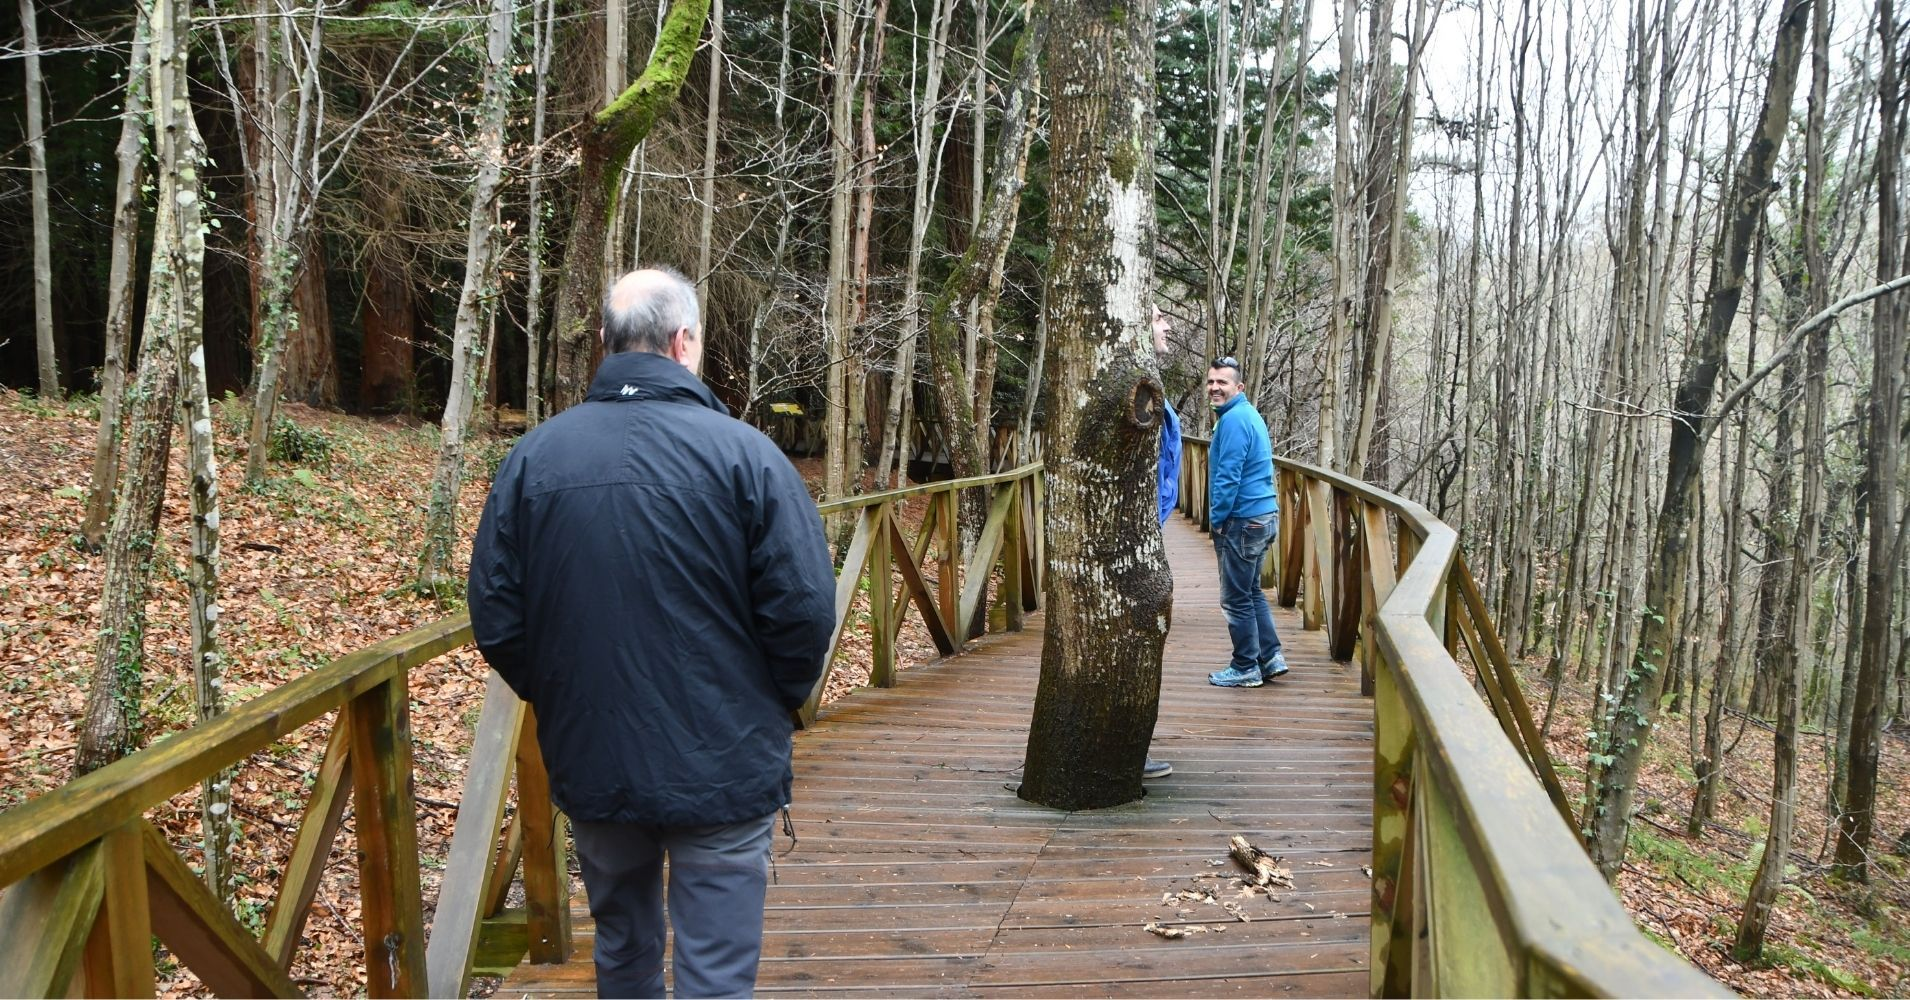 Pasarela del Bosque de Secuoyas. Cabezón de la Sal, Cantabria.